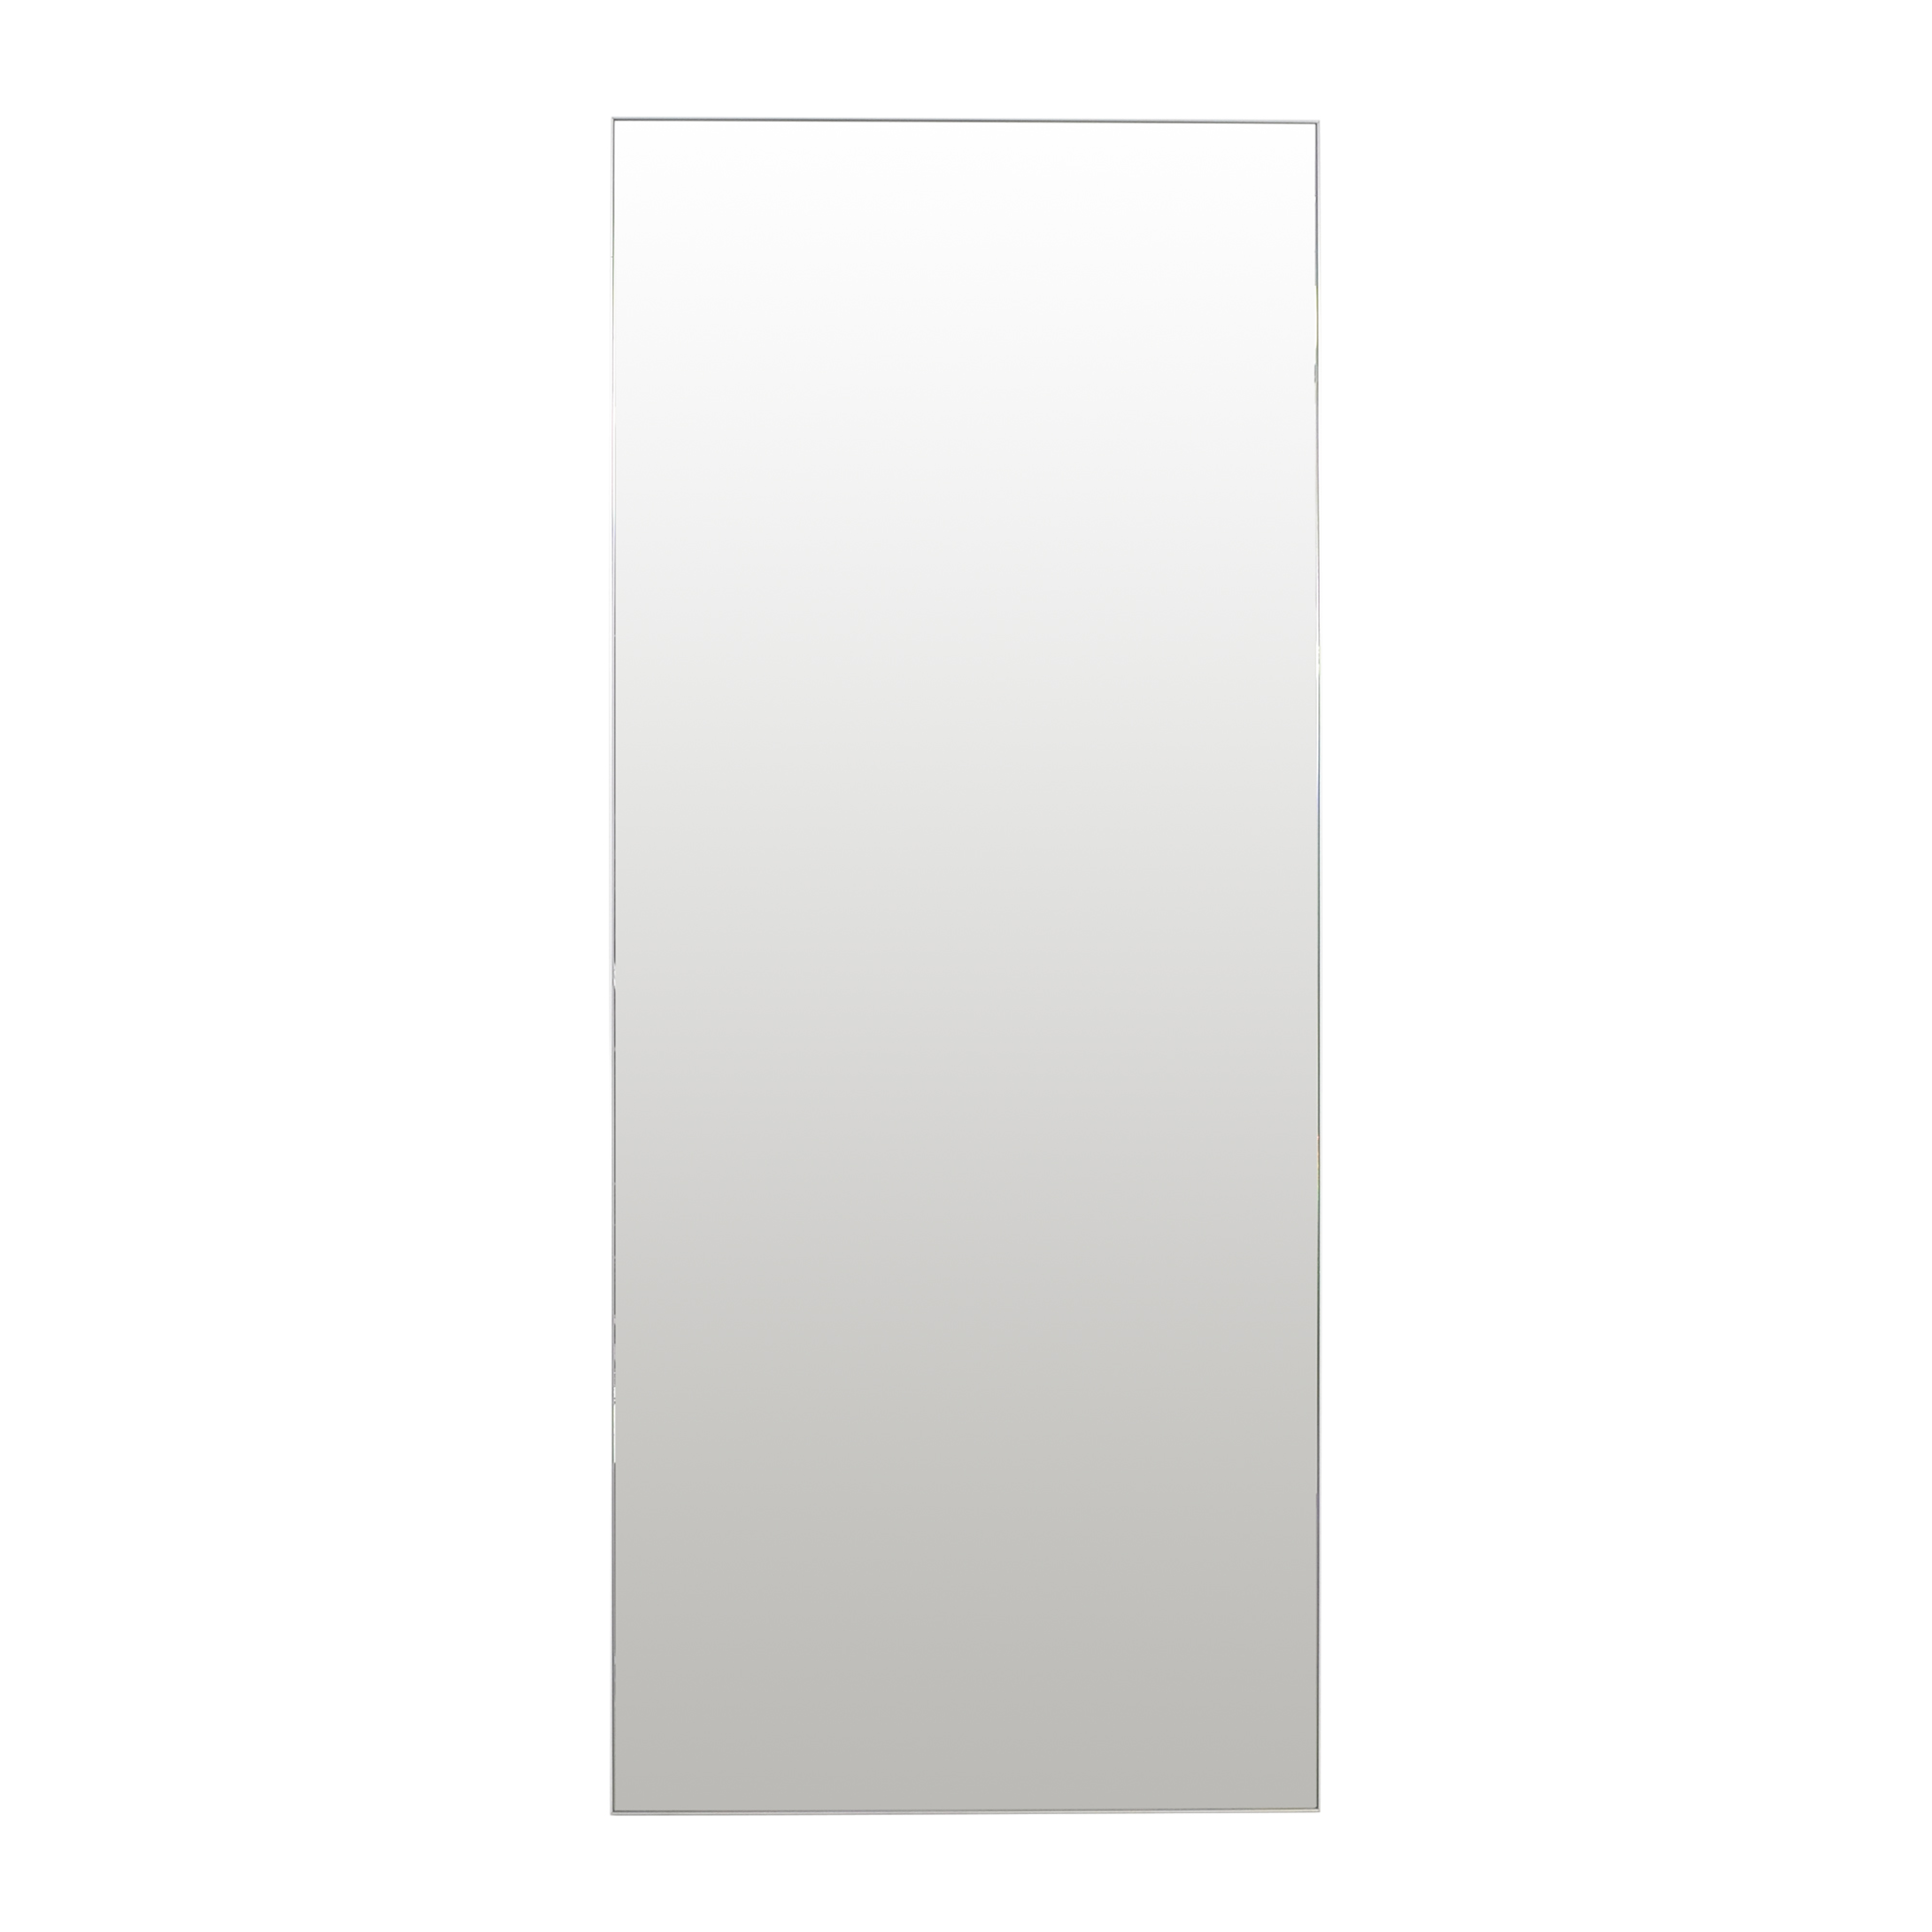 CB2 Infinity Floor Mirror / Mirrors